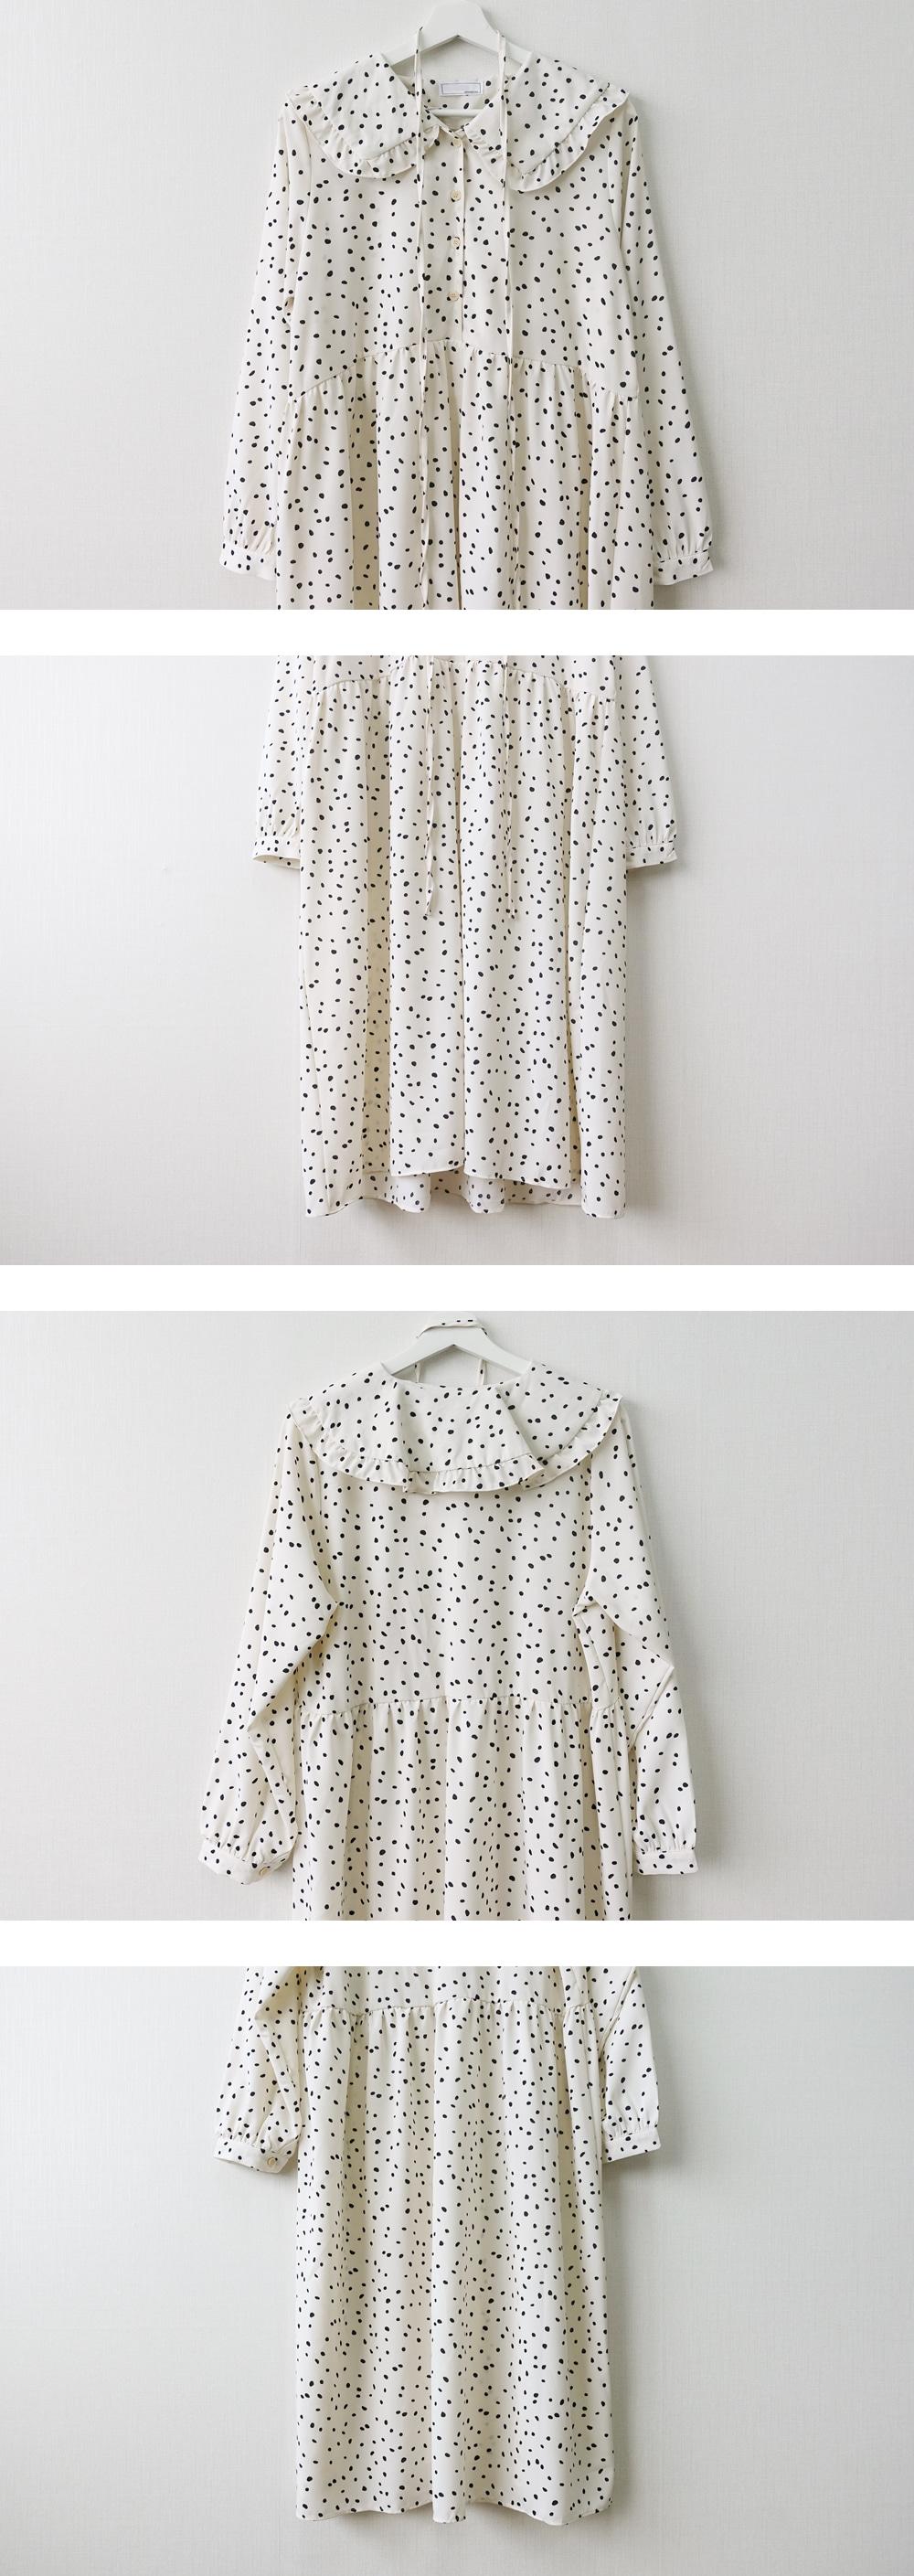 Long-sleeved dress with frills black dot